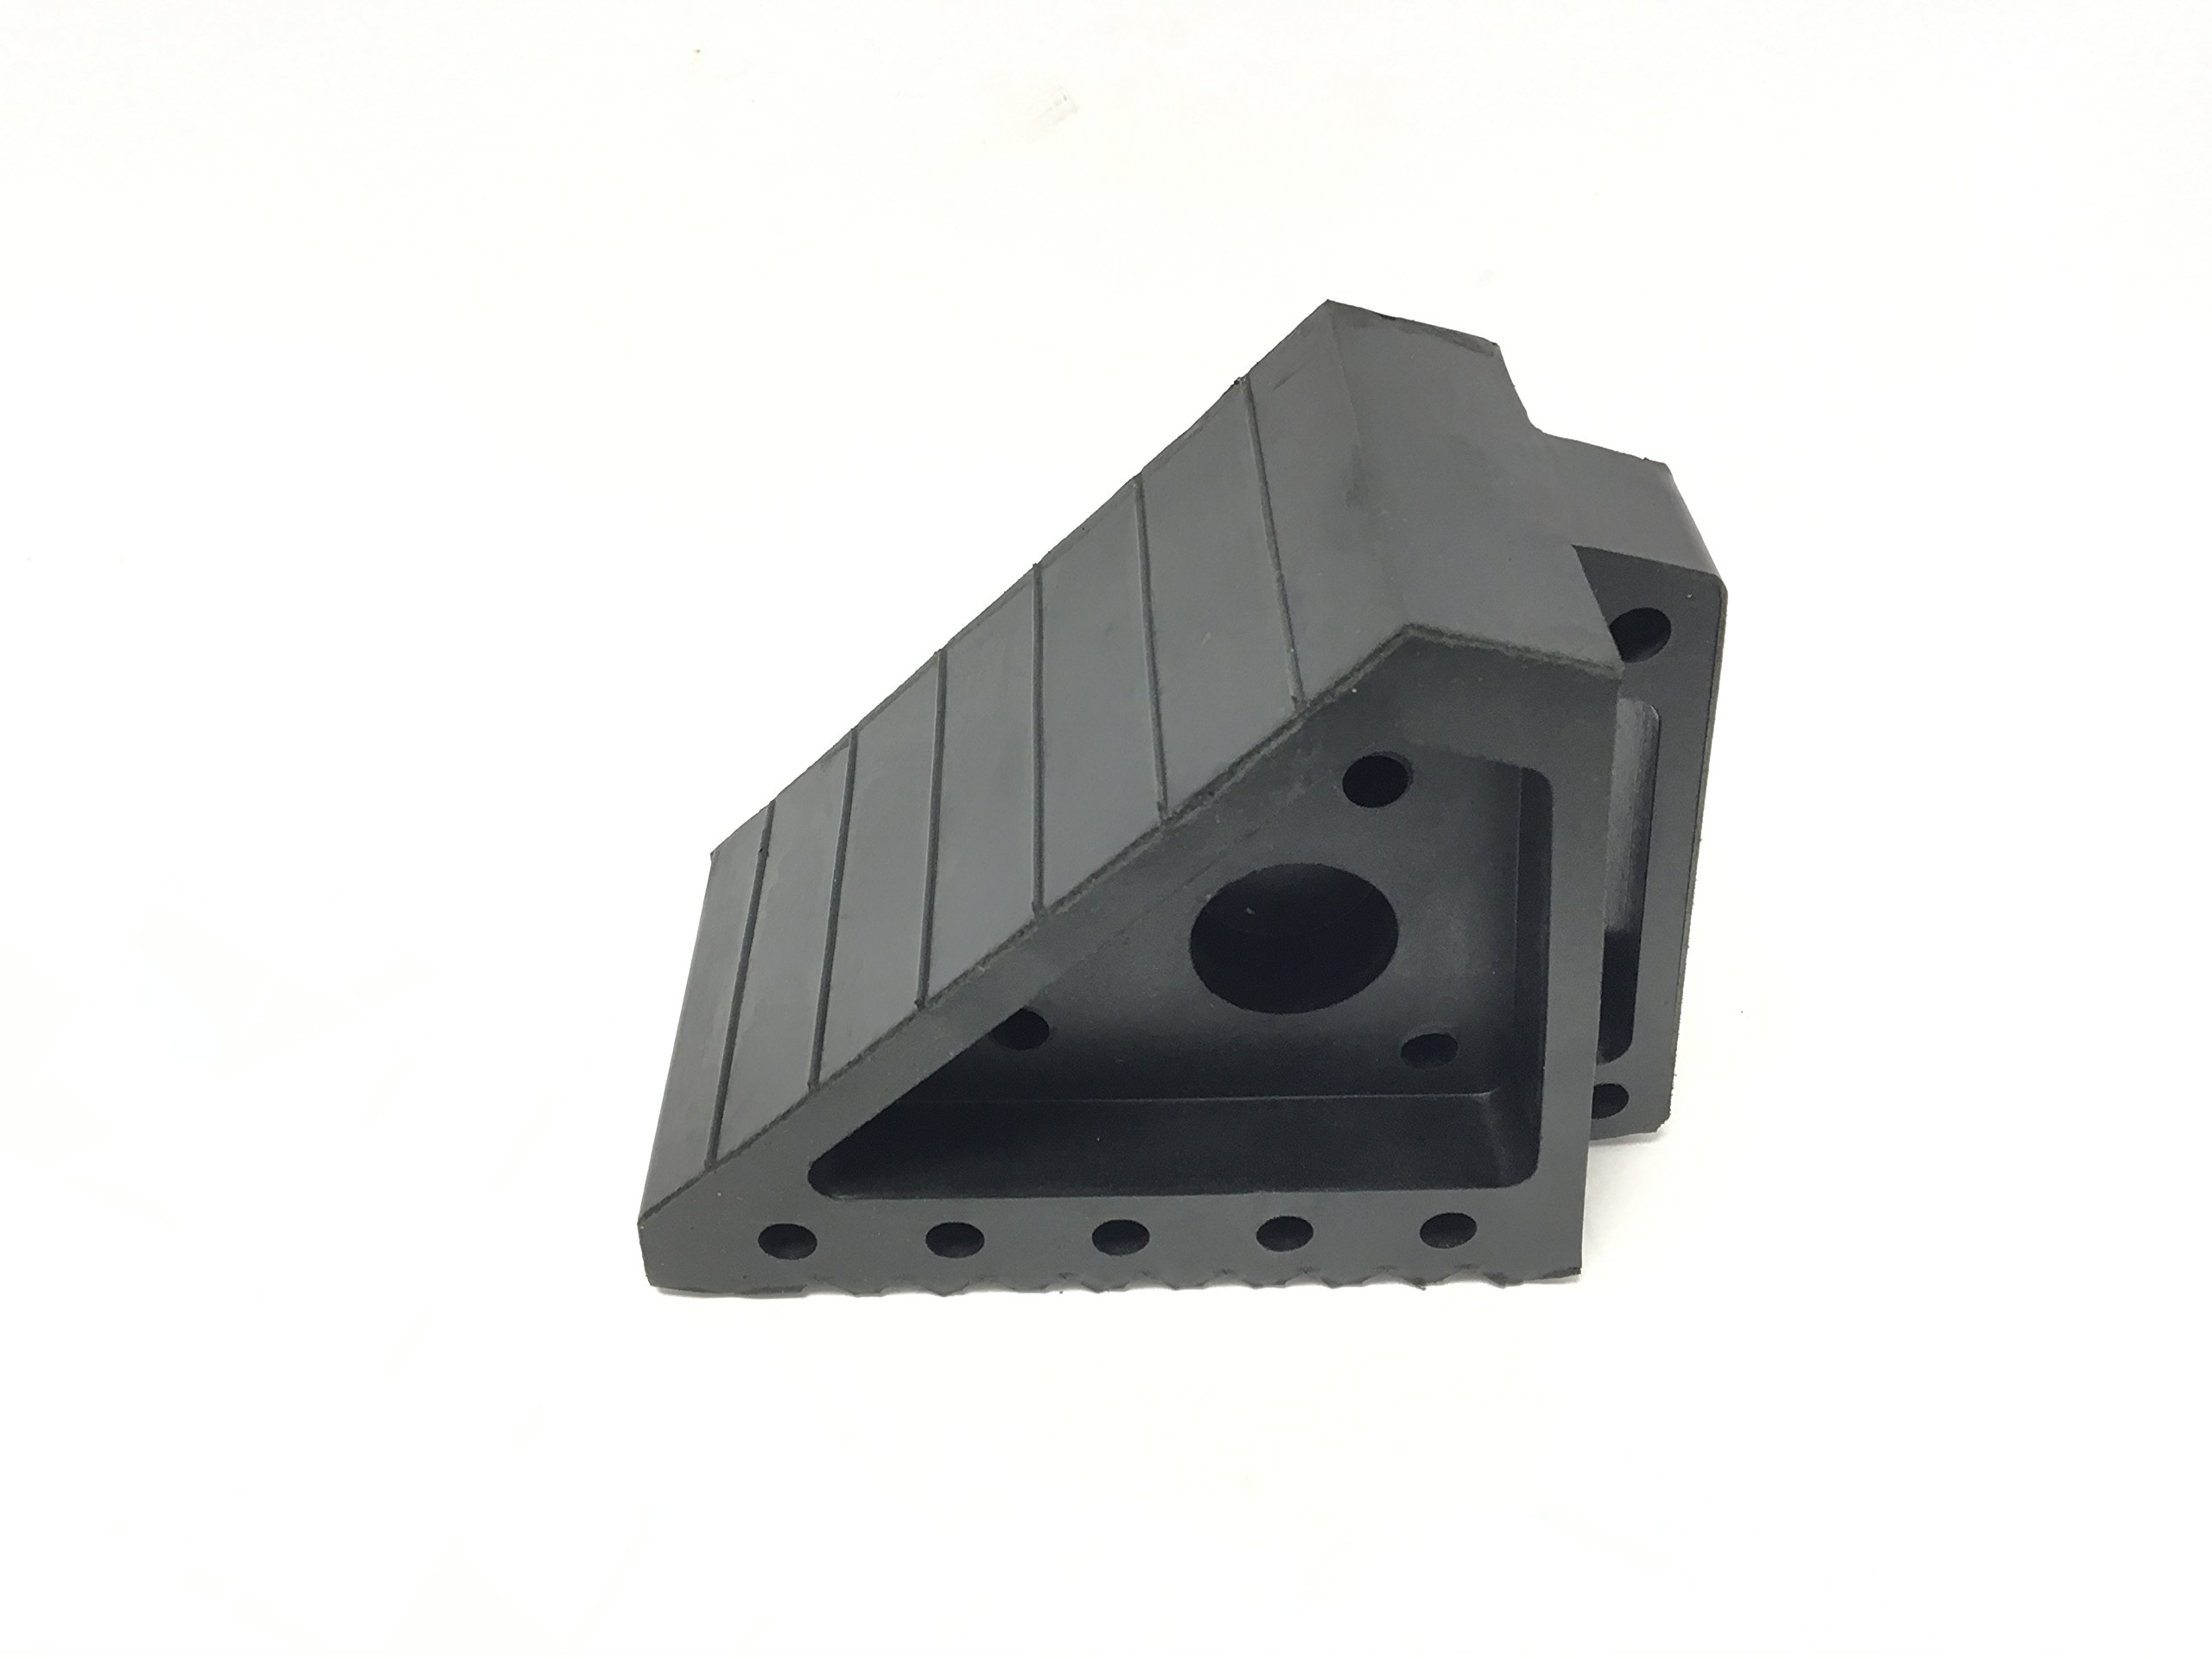 MaxxHaul 2 pack 70472 Solid Rubber Heavy Duty Black Wheel Chock, 8'' Long x 4'' Wide x 6'' high-2 Pack, 2 pack